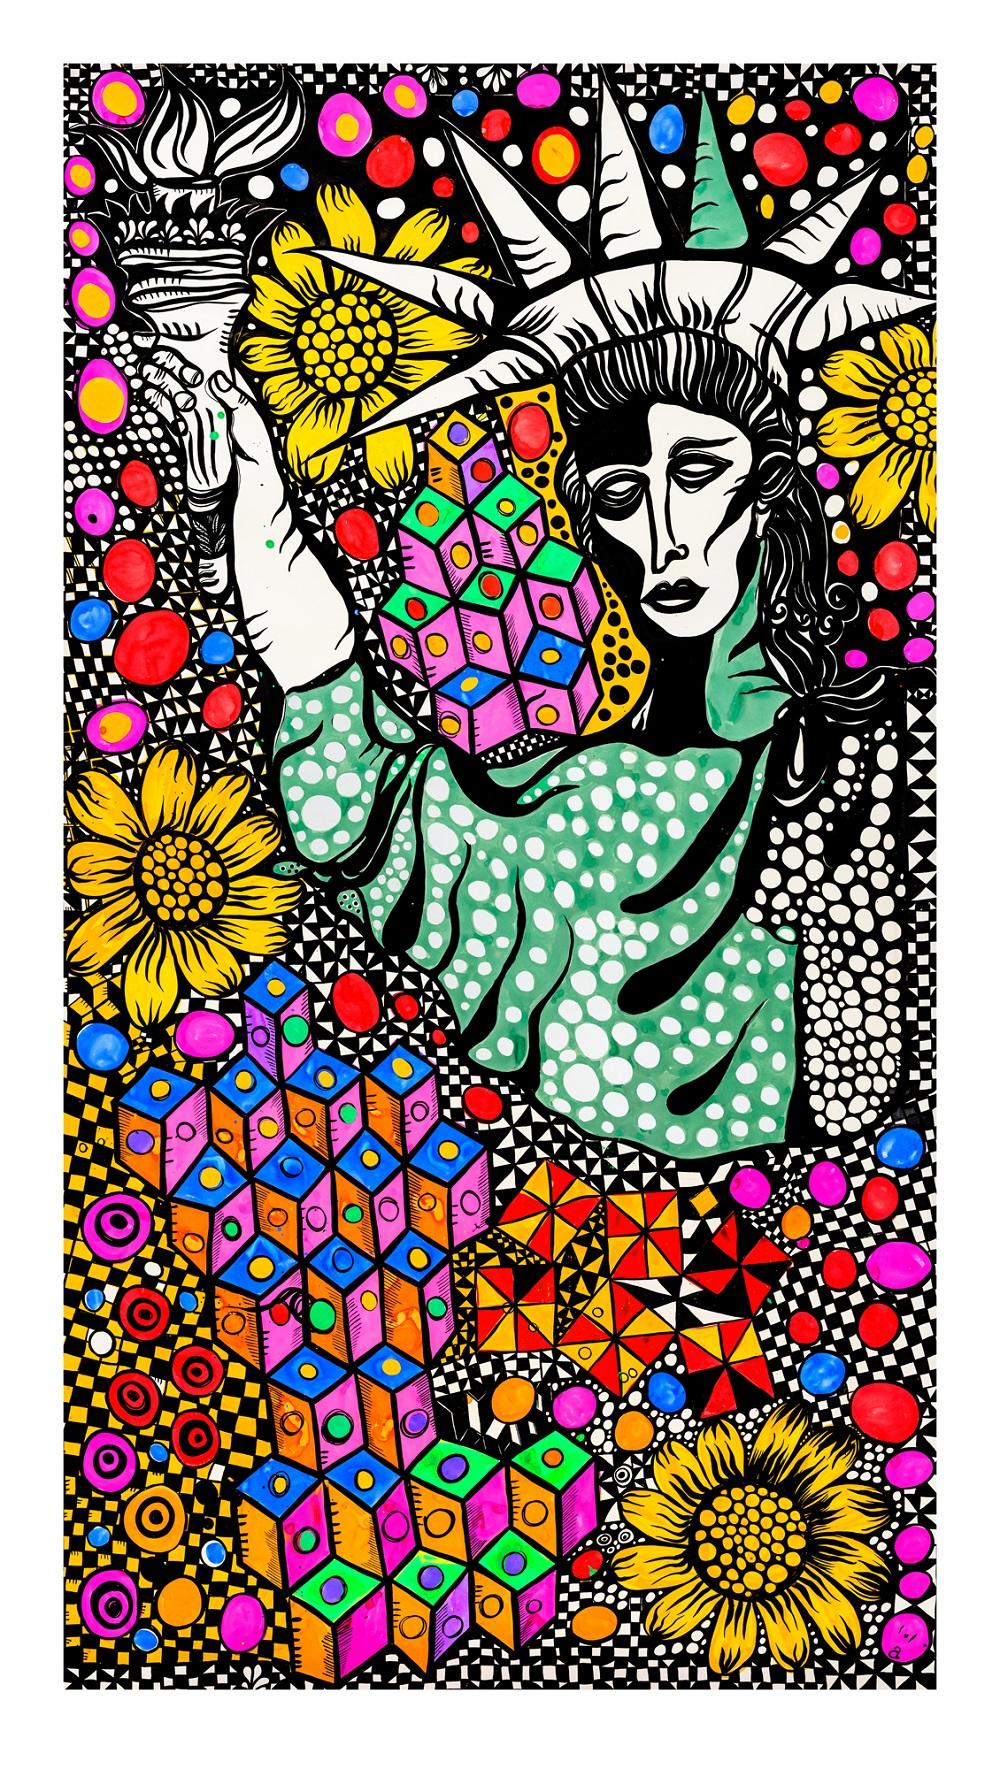 Libertad, gouache tinta y collage sobre papel, 190 x 110 cm, 2013. Foto: Dolores Ochoa